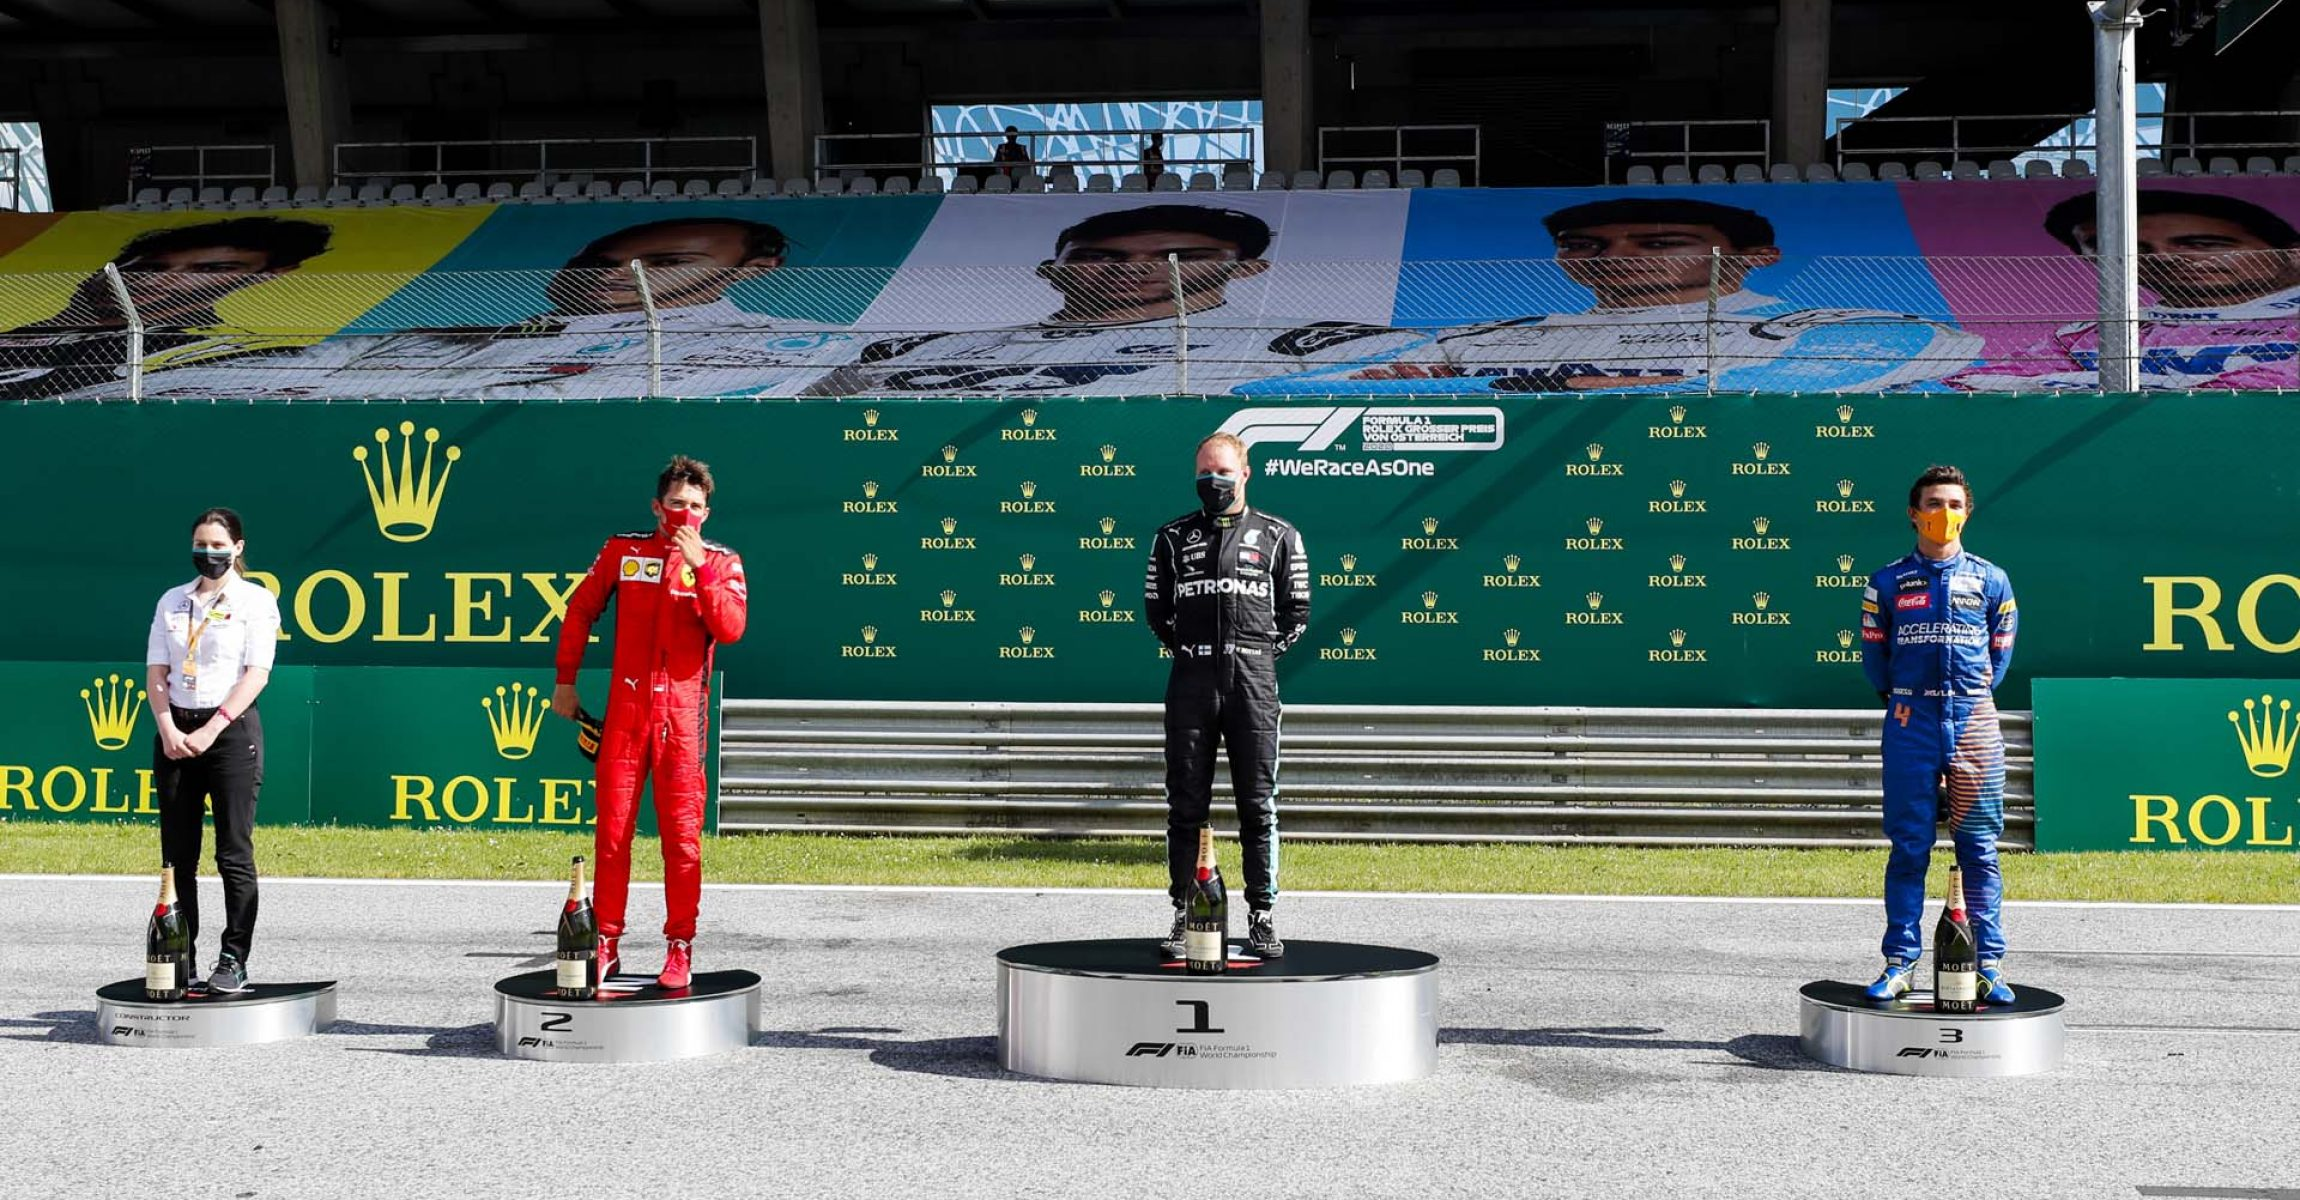 JULY 05: Mercedes Team Member, Charles Leclerc, Ferrari, race winner Valtteri Bottas, Mercedes-AMG Petronas F1 and Lando Norris, McLaren on the podium during the Austrian GP on Sunday July 05, 2020. (Photo by Steven Tee / LAT Images)